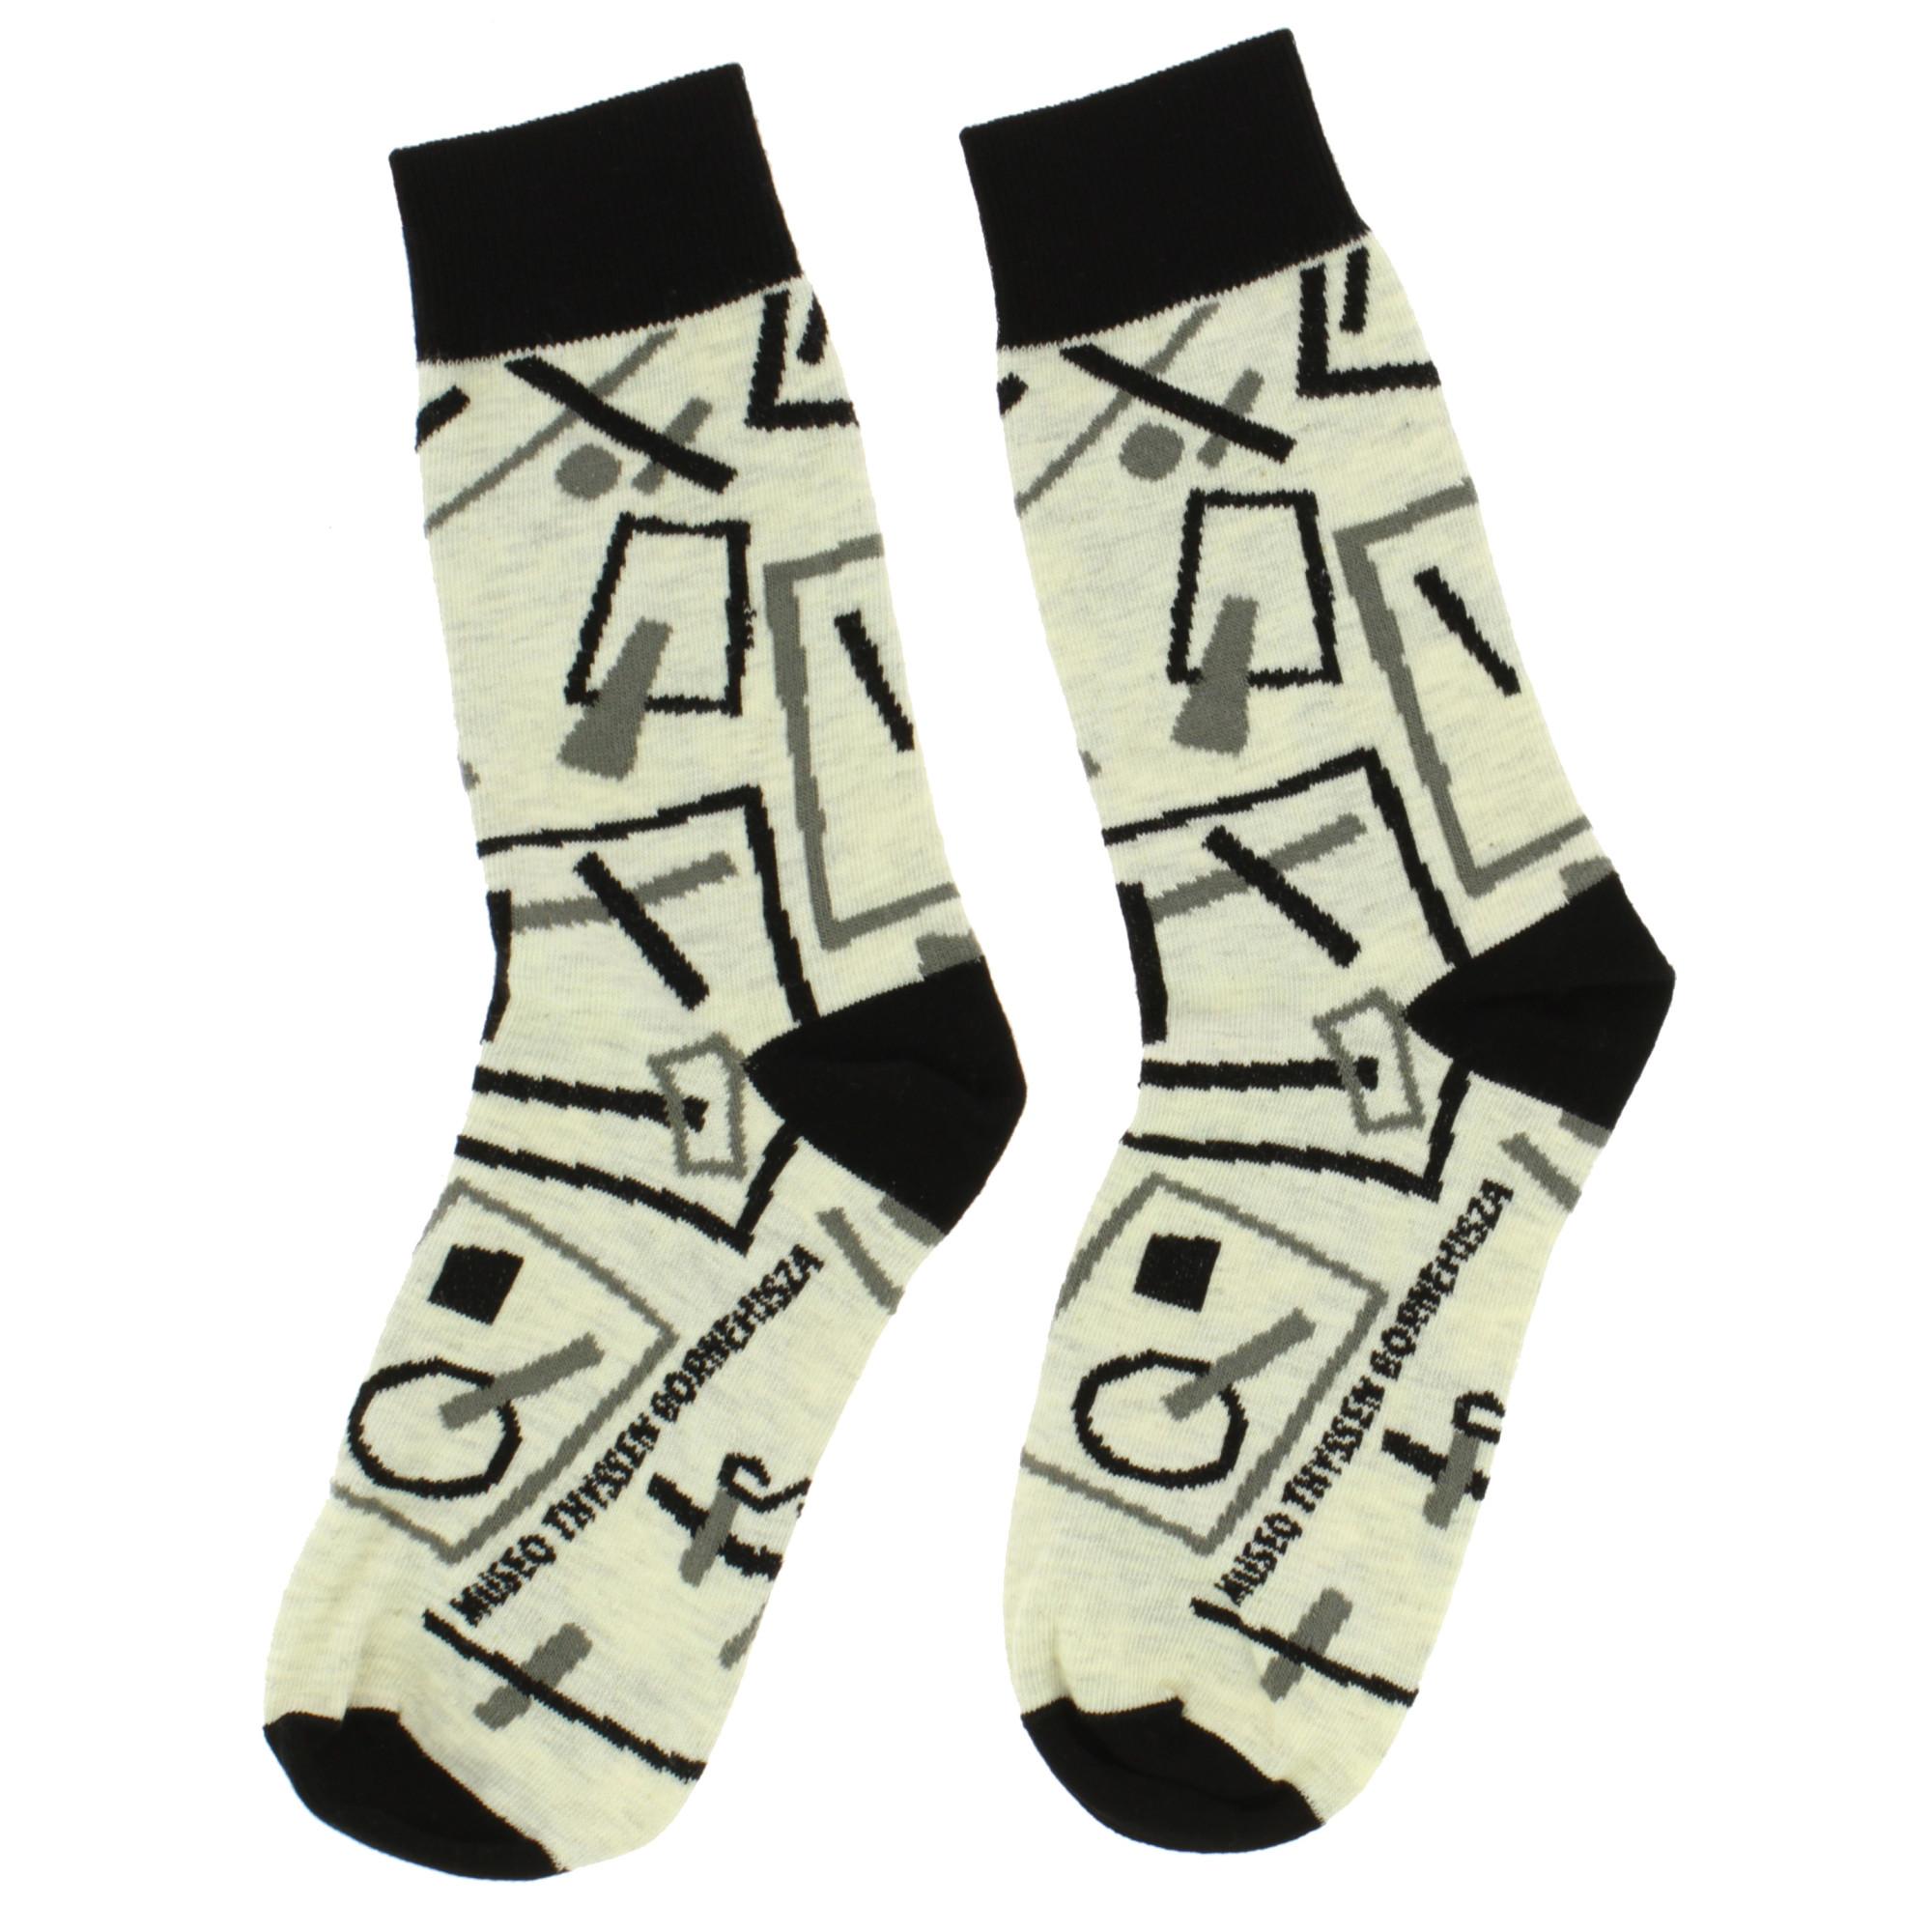 zoom Socks Malévich Suprematist Drawings